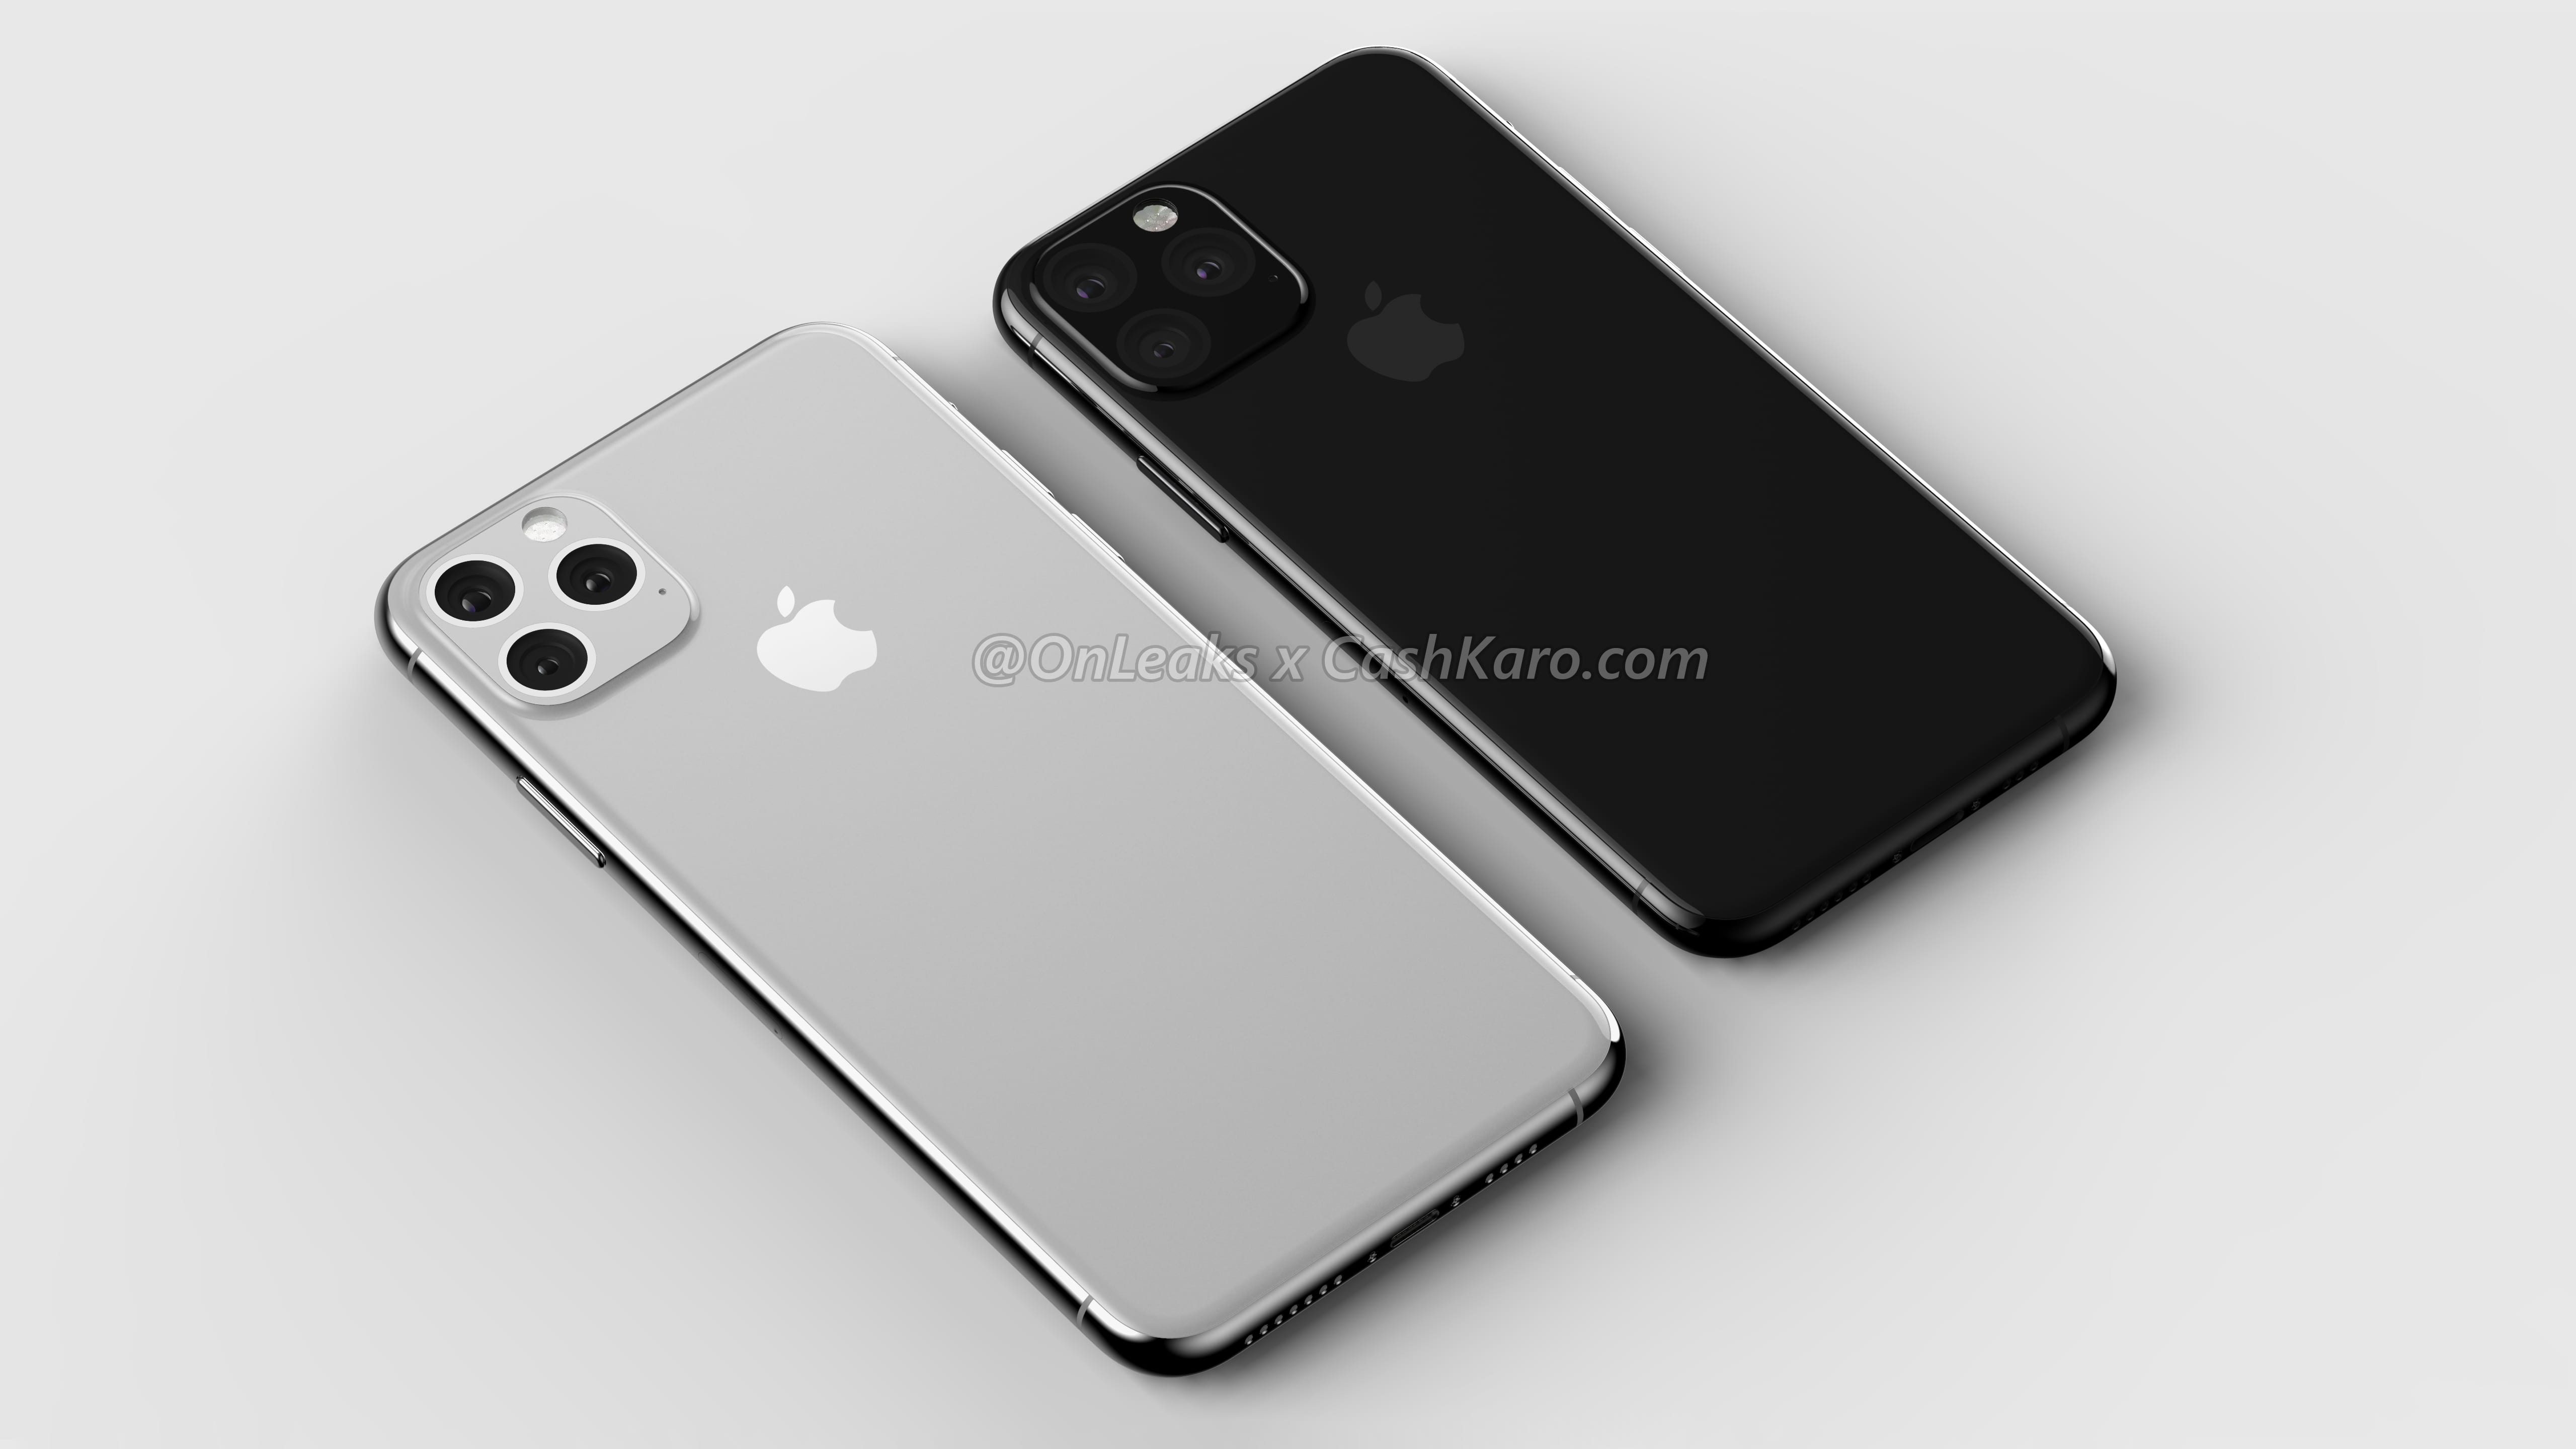 iPhone-XI-vs-iPhone-XI-Max-5K3-min